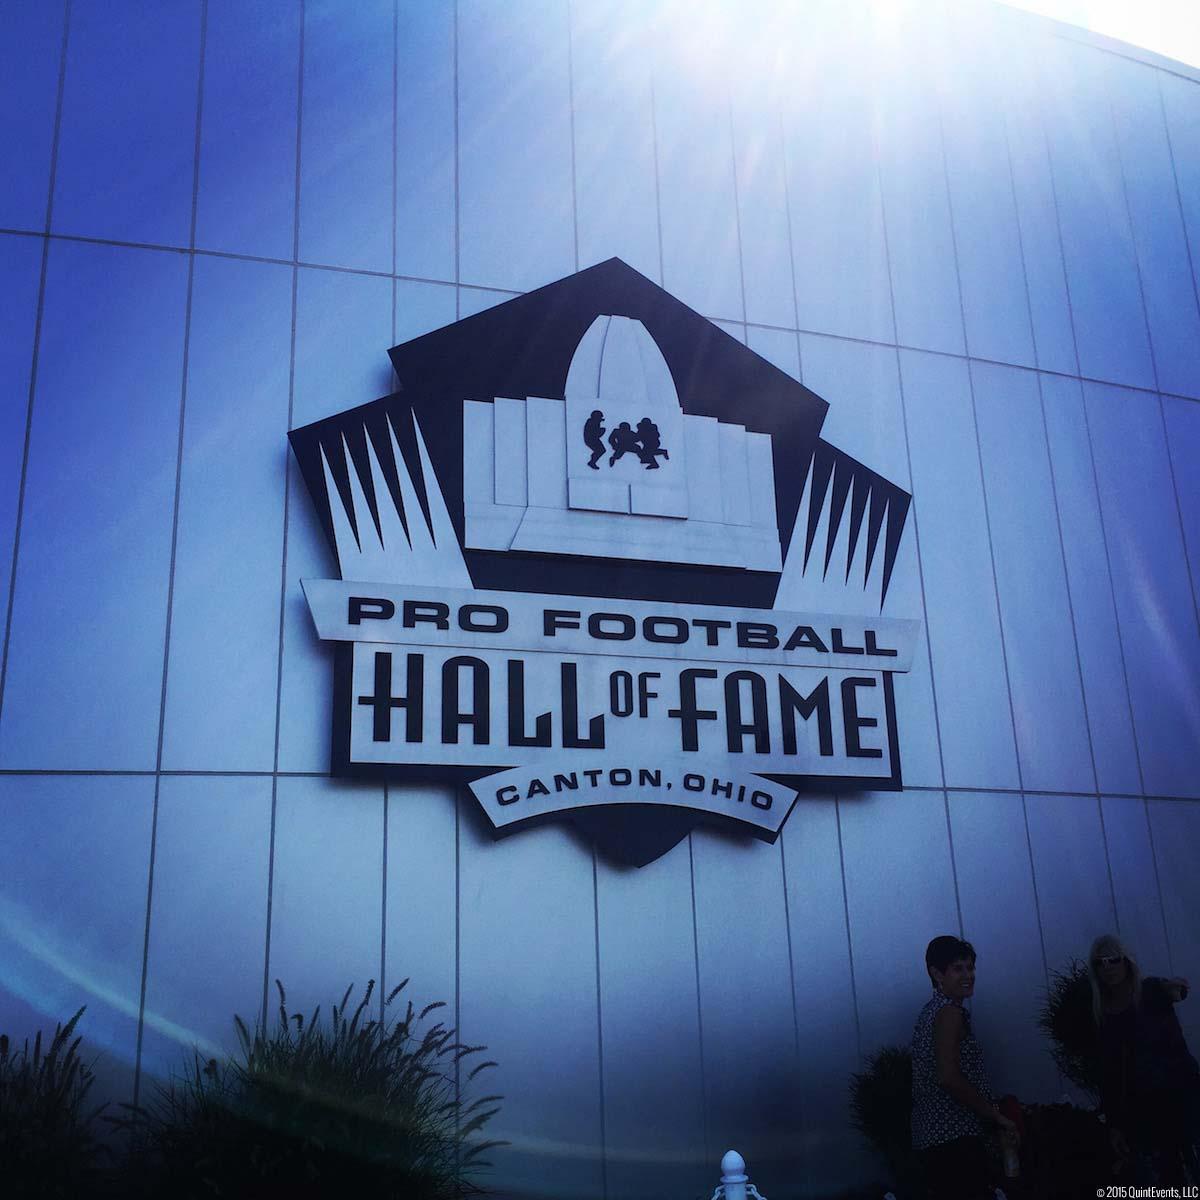 Pro-Football-Hall-of-Fame-Building-05-1.jpg